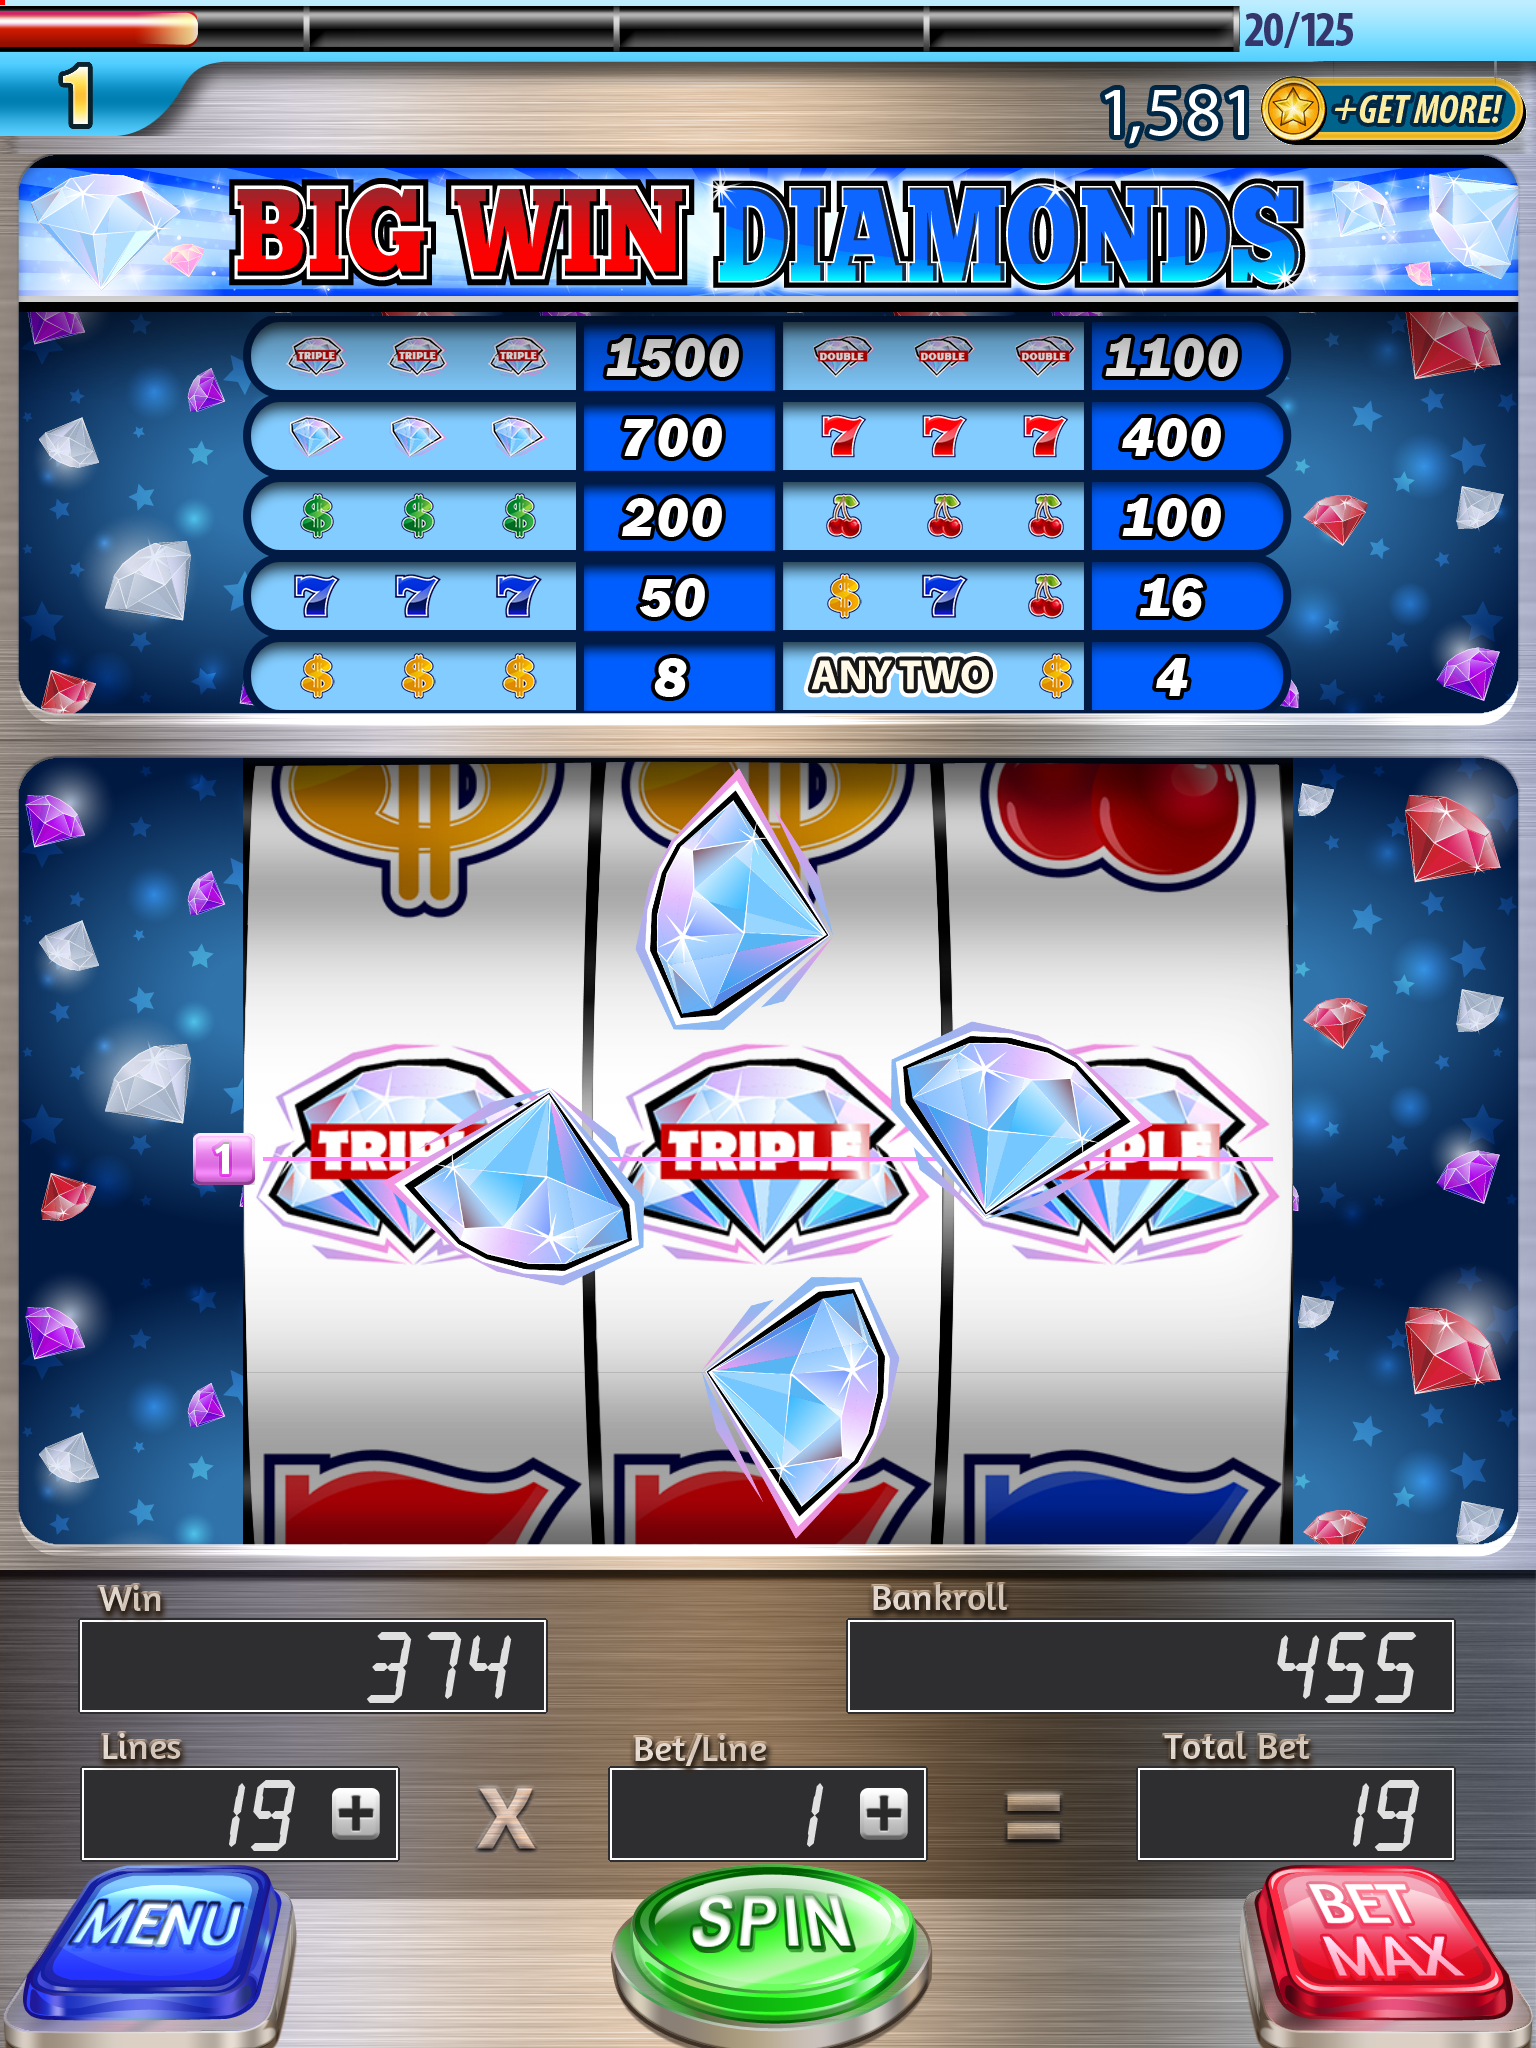 Mobile deluxe big win slots alamo city poker club san antonio